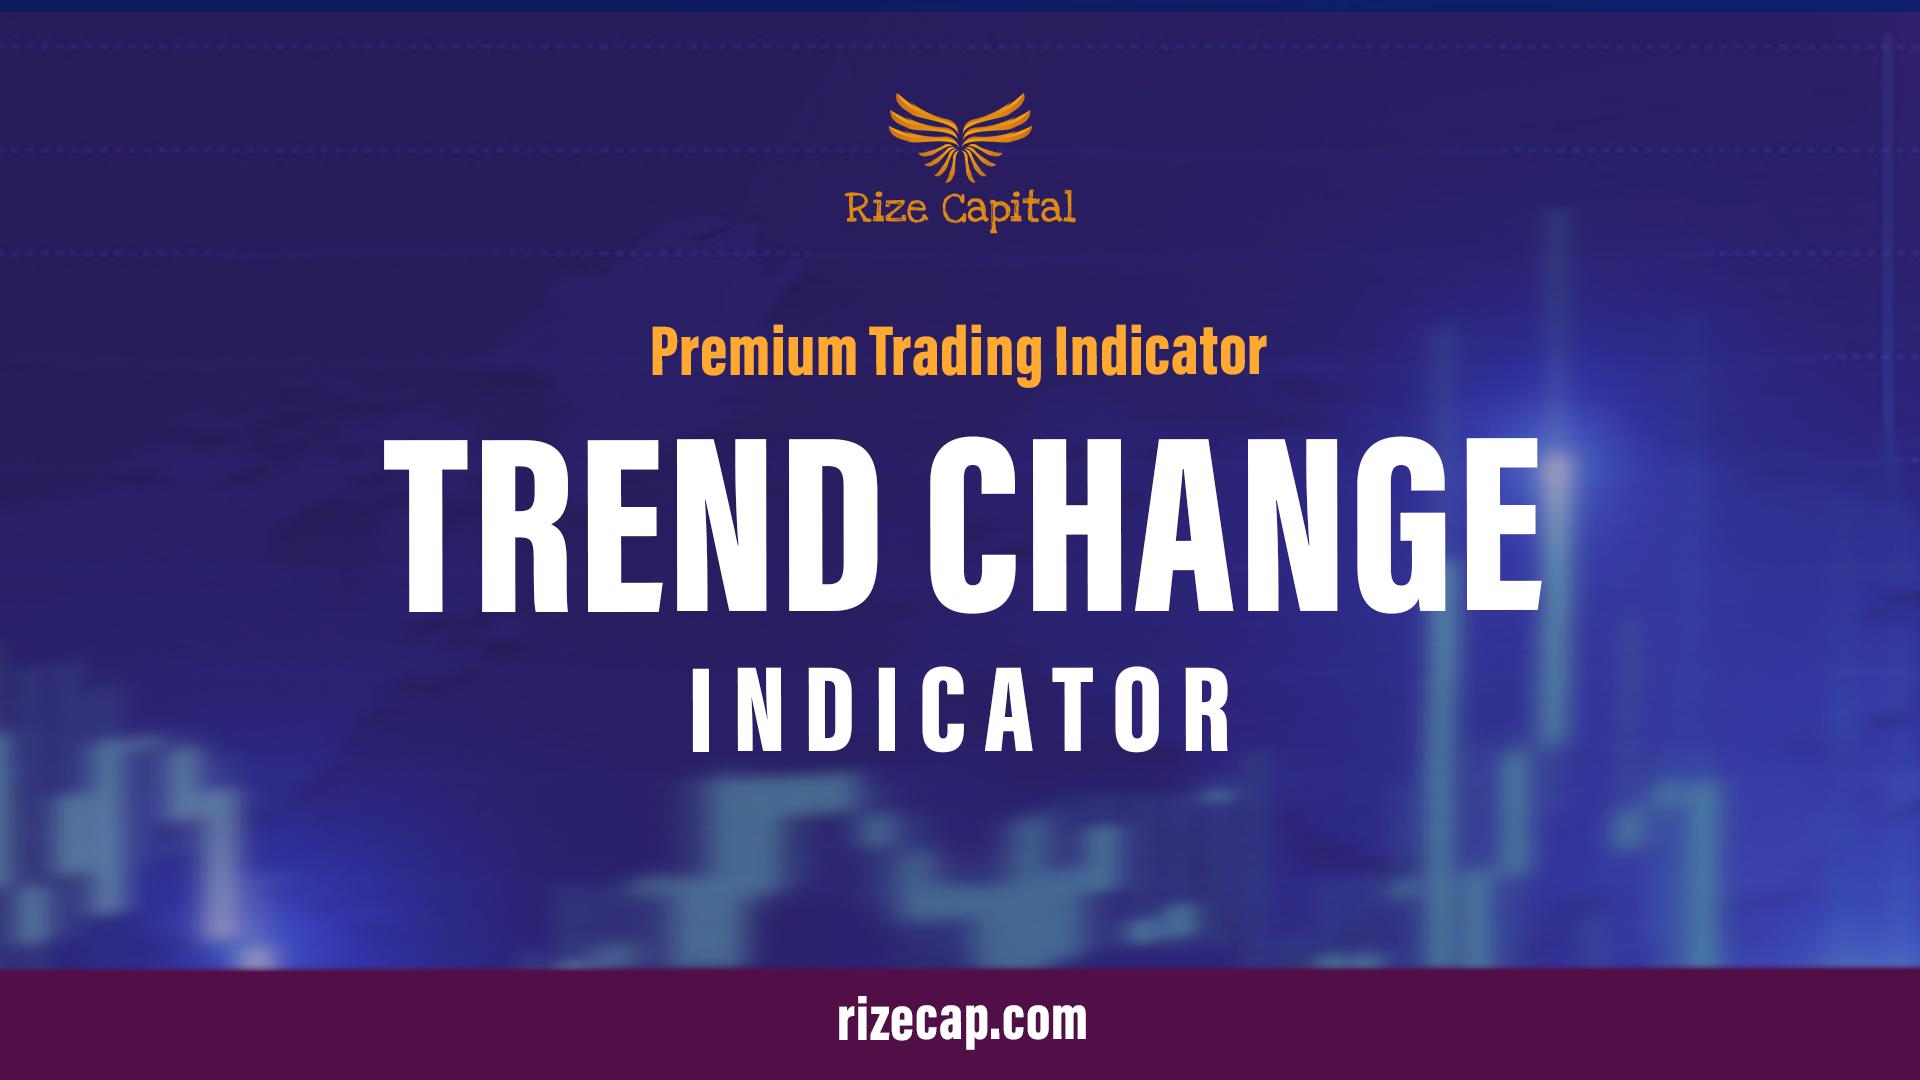 Trend Change Premium Indicator